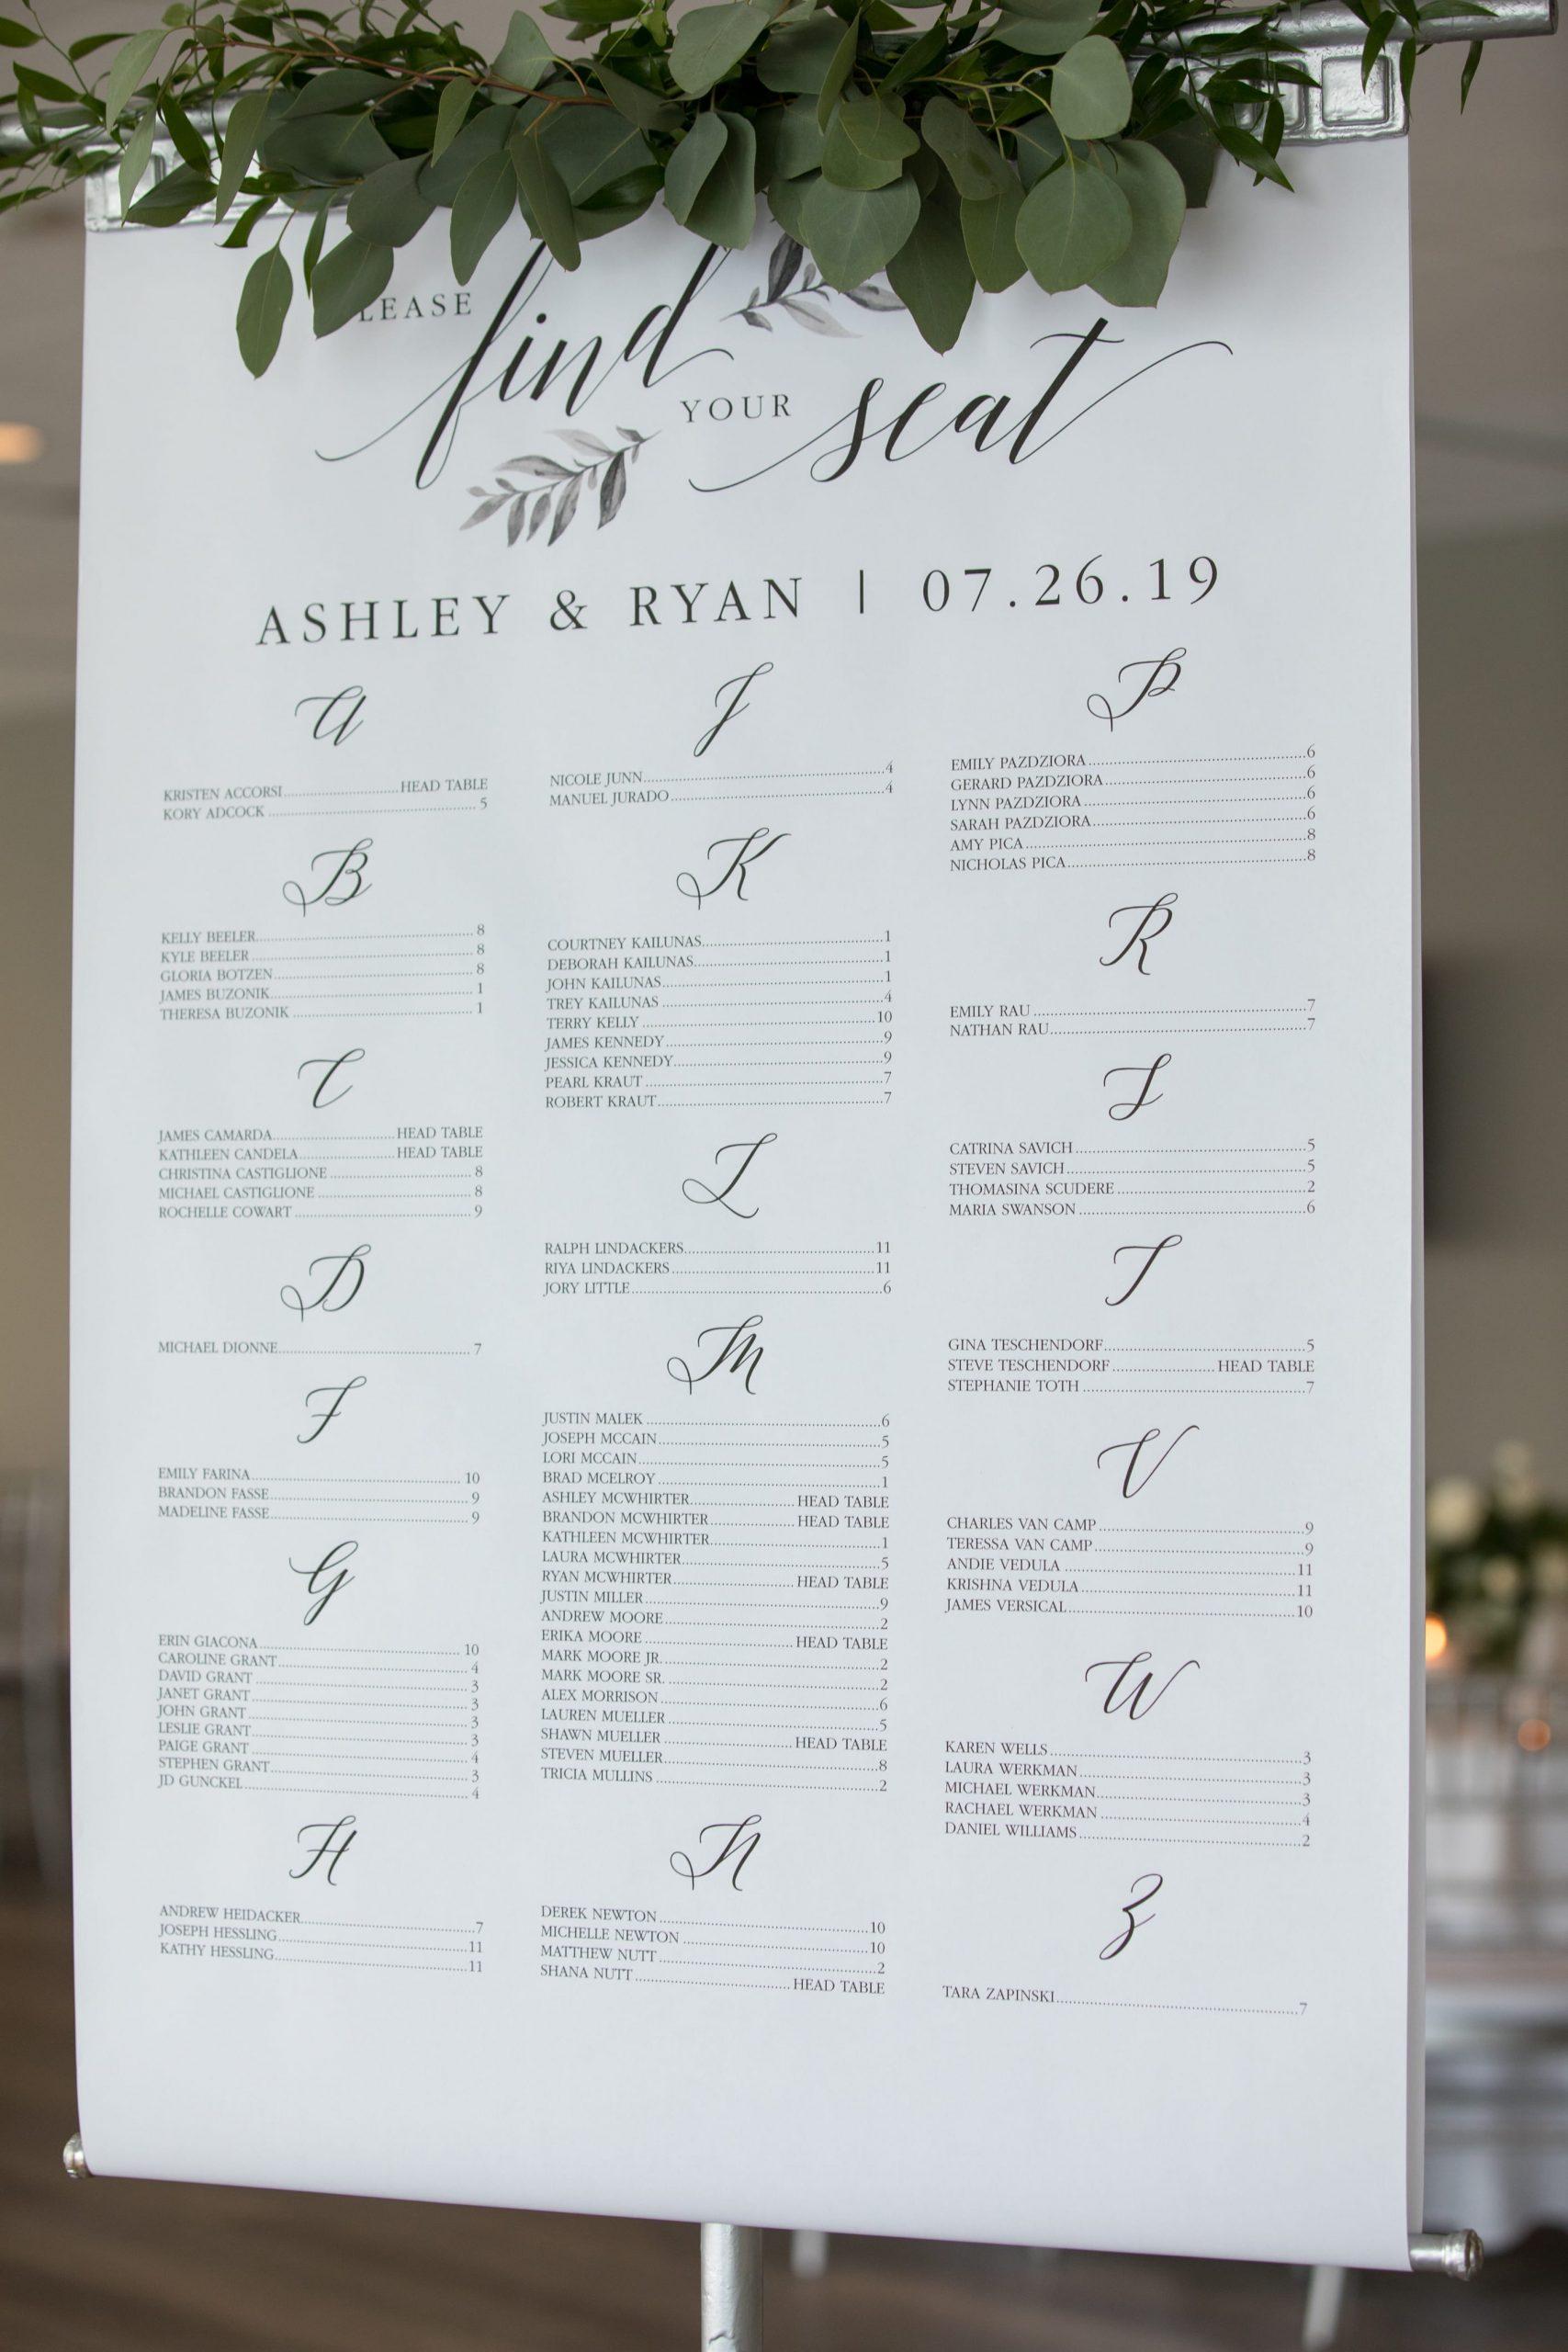 printed seating arrangements sign